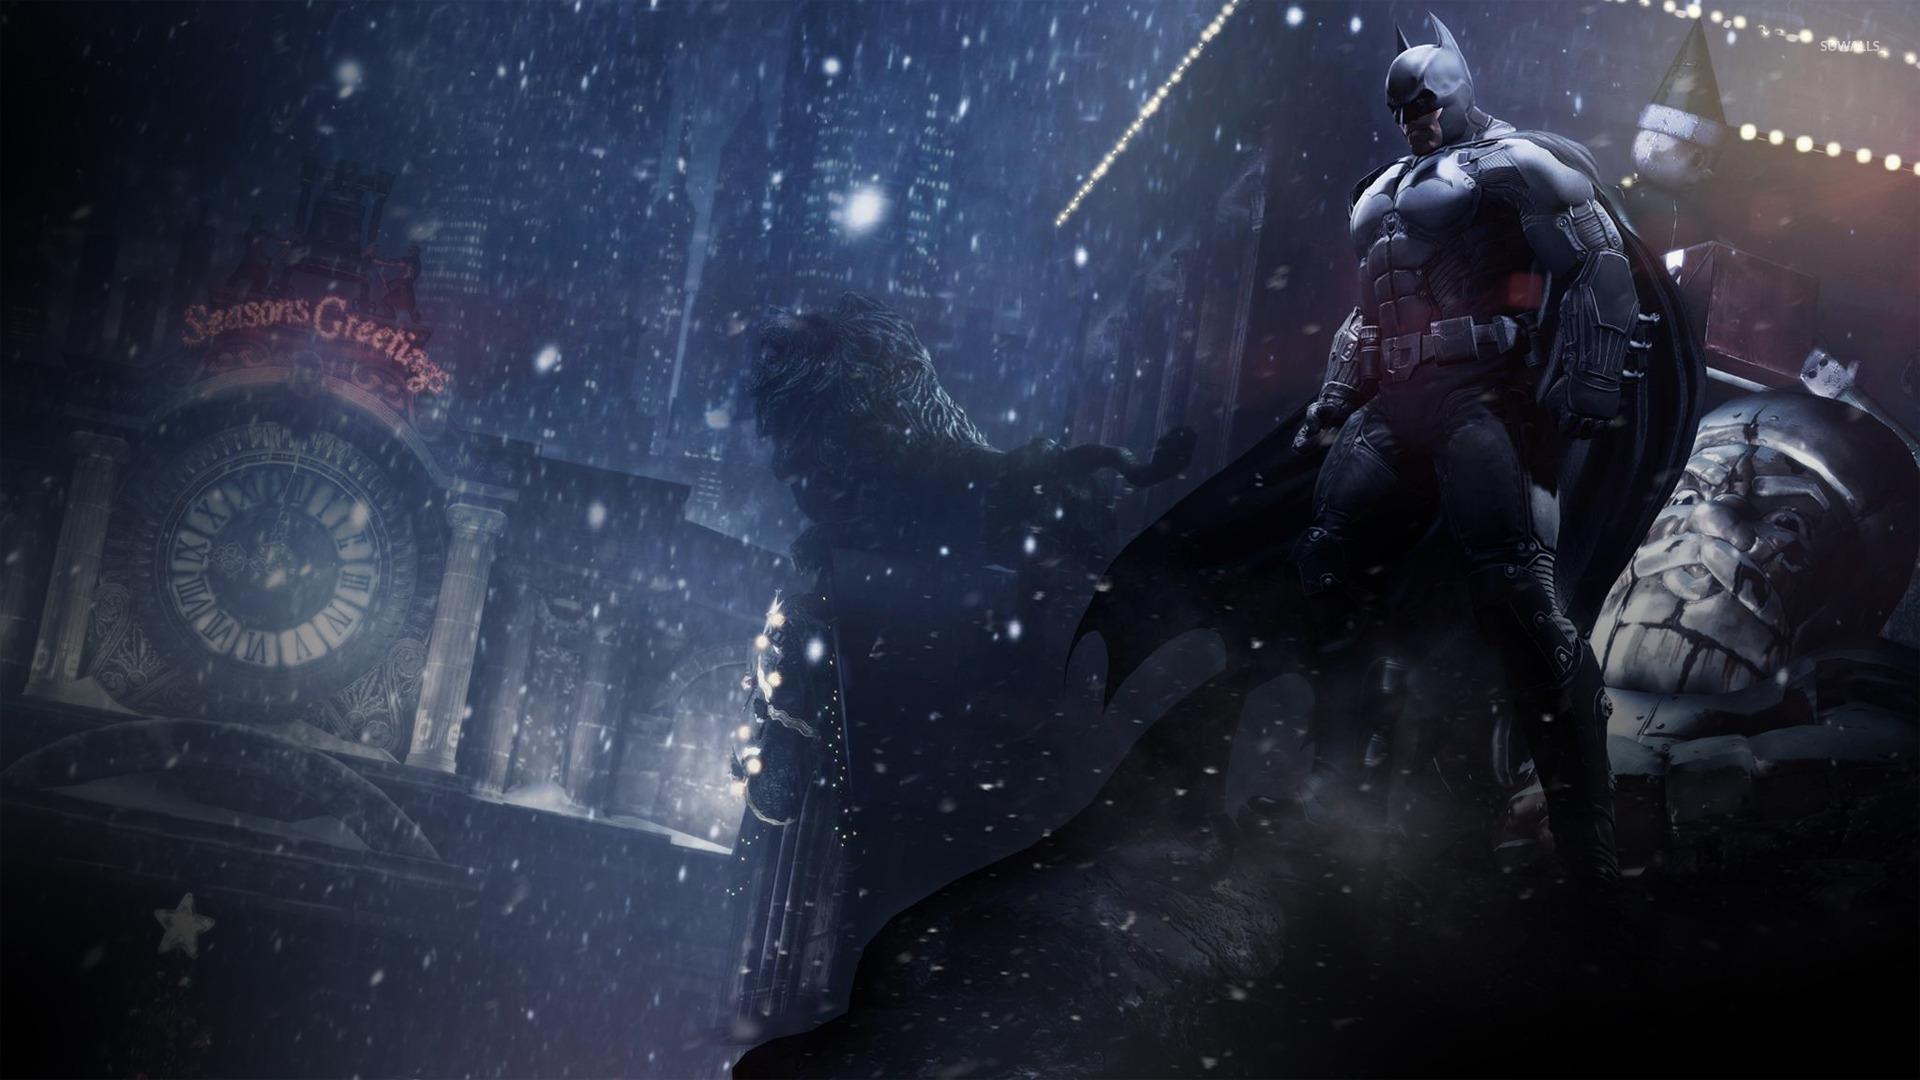 Batman Arkham Origins wallpaper   Game wallpapers   21375 1366x768